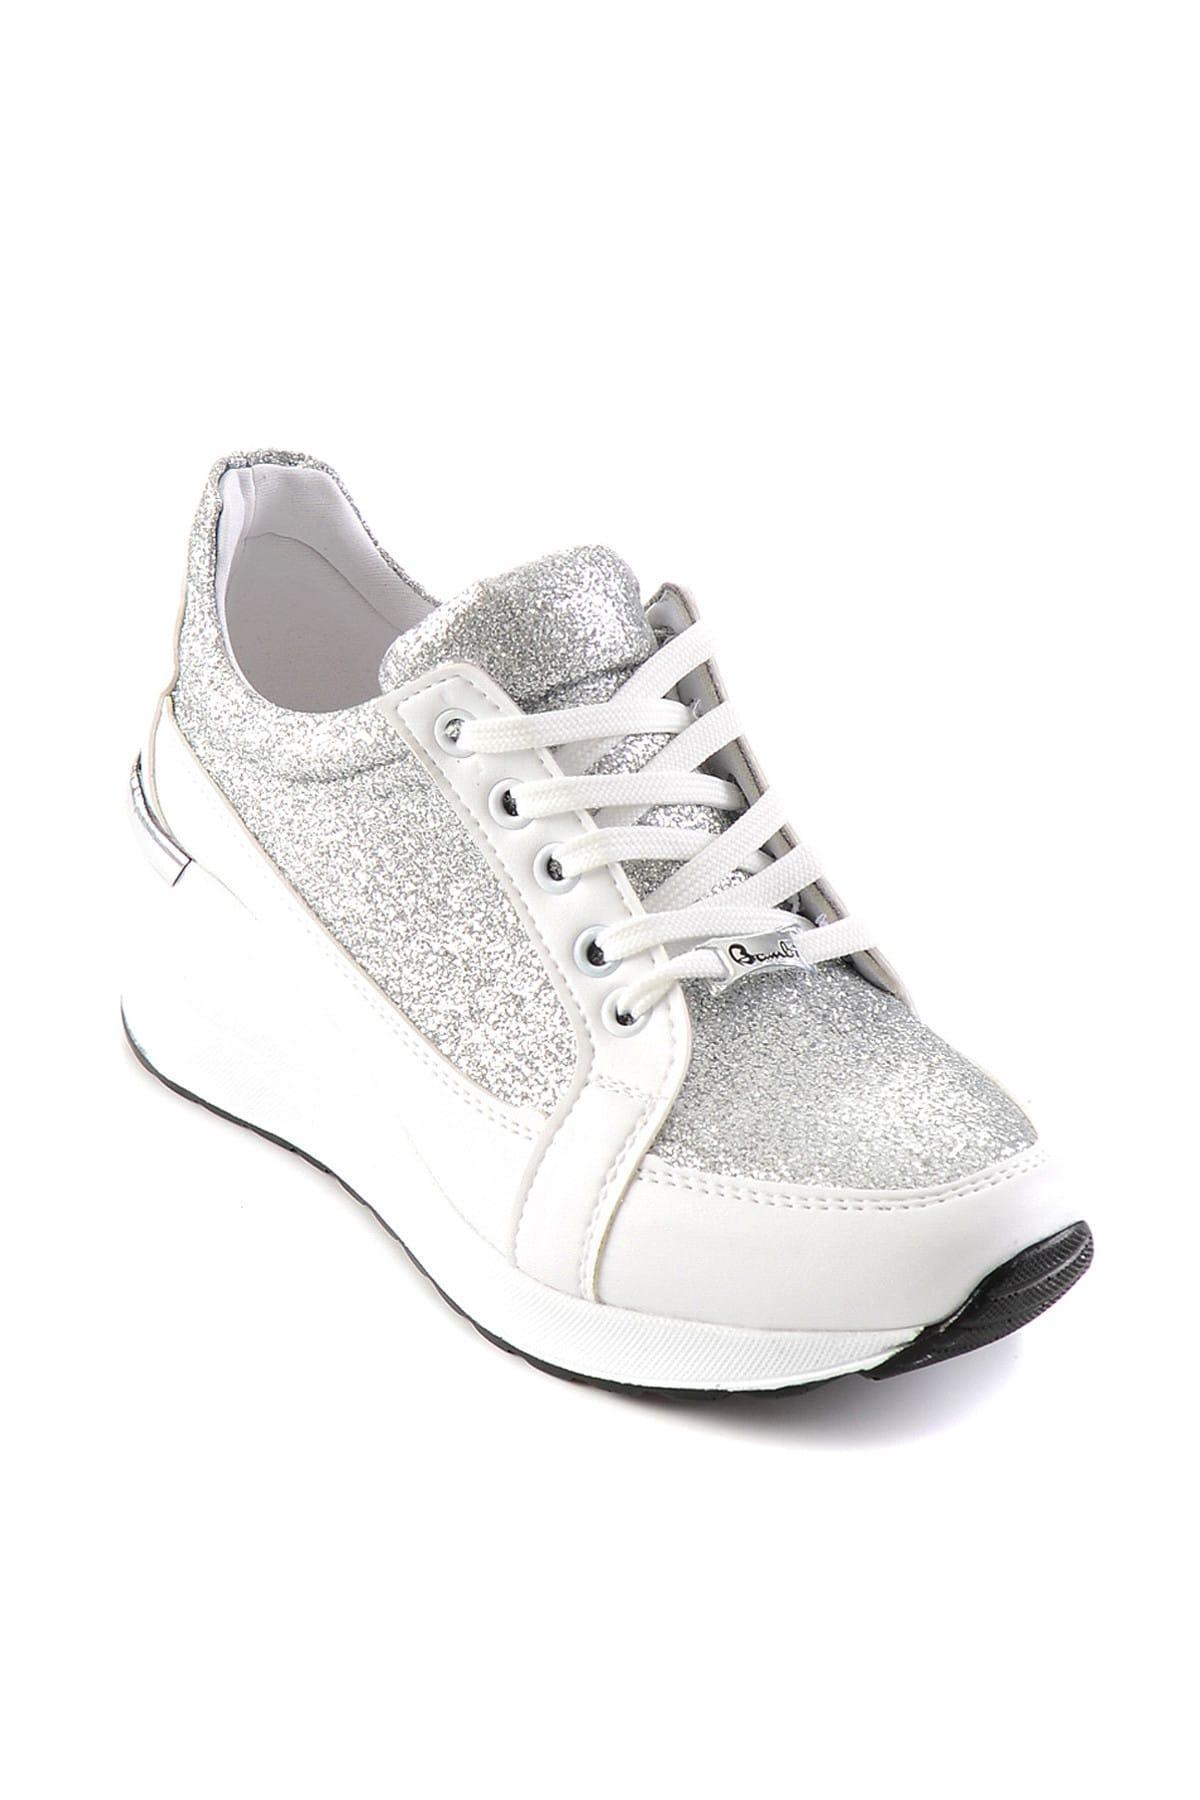 Bambi Mulheres White 'S Sneaker H0512078009